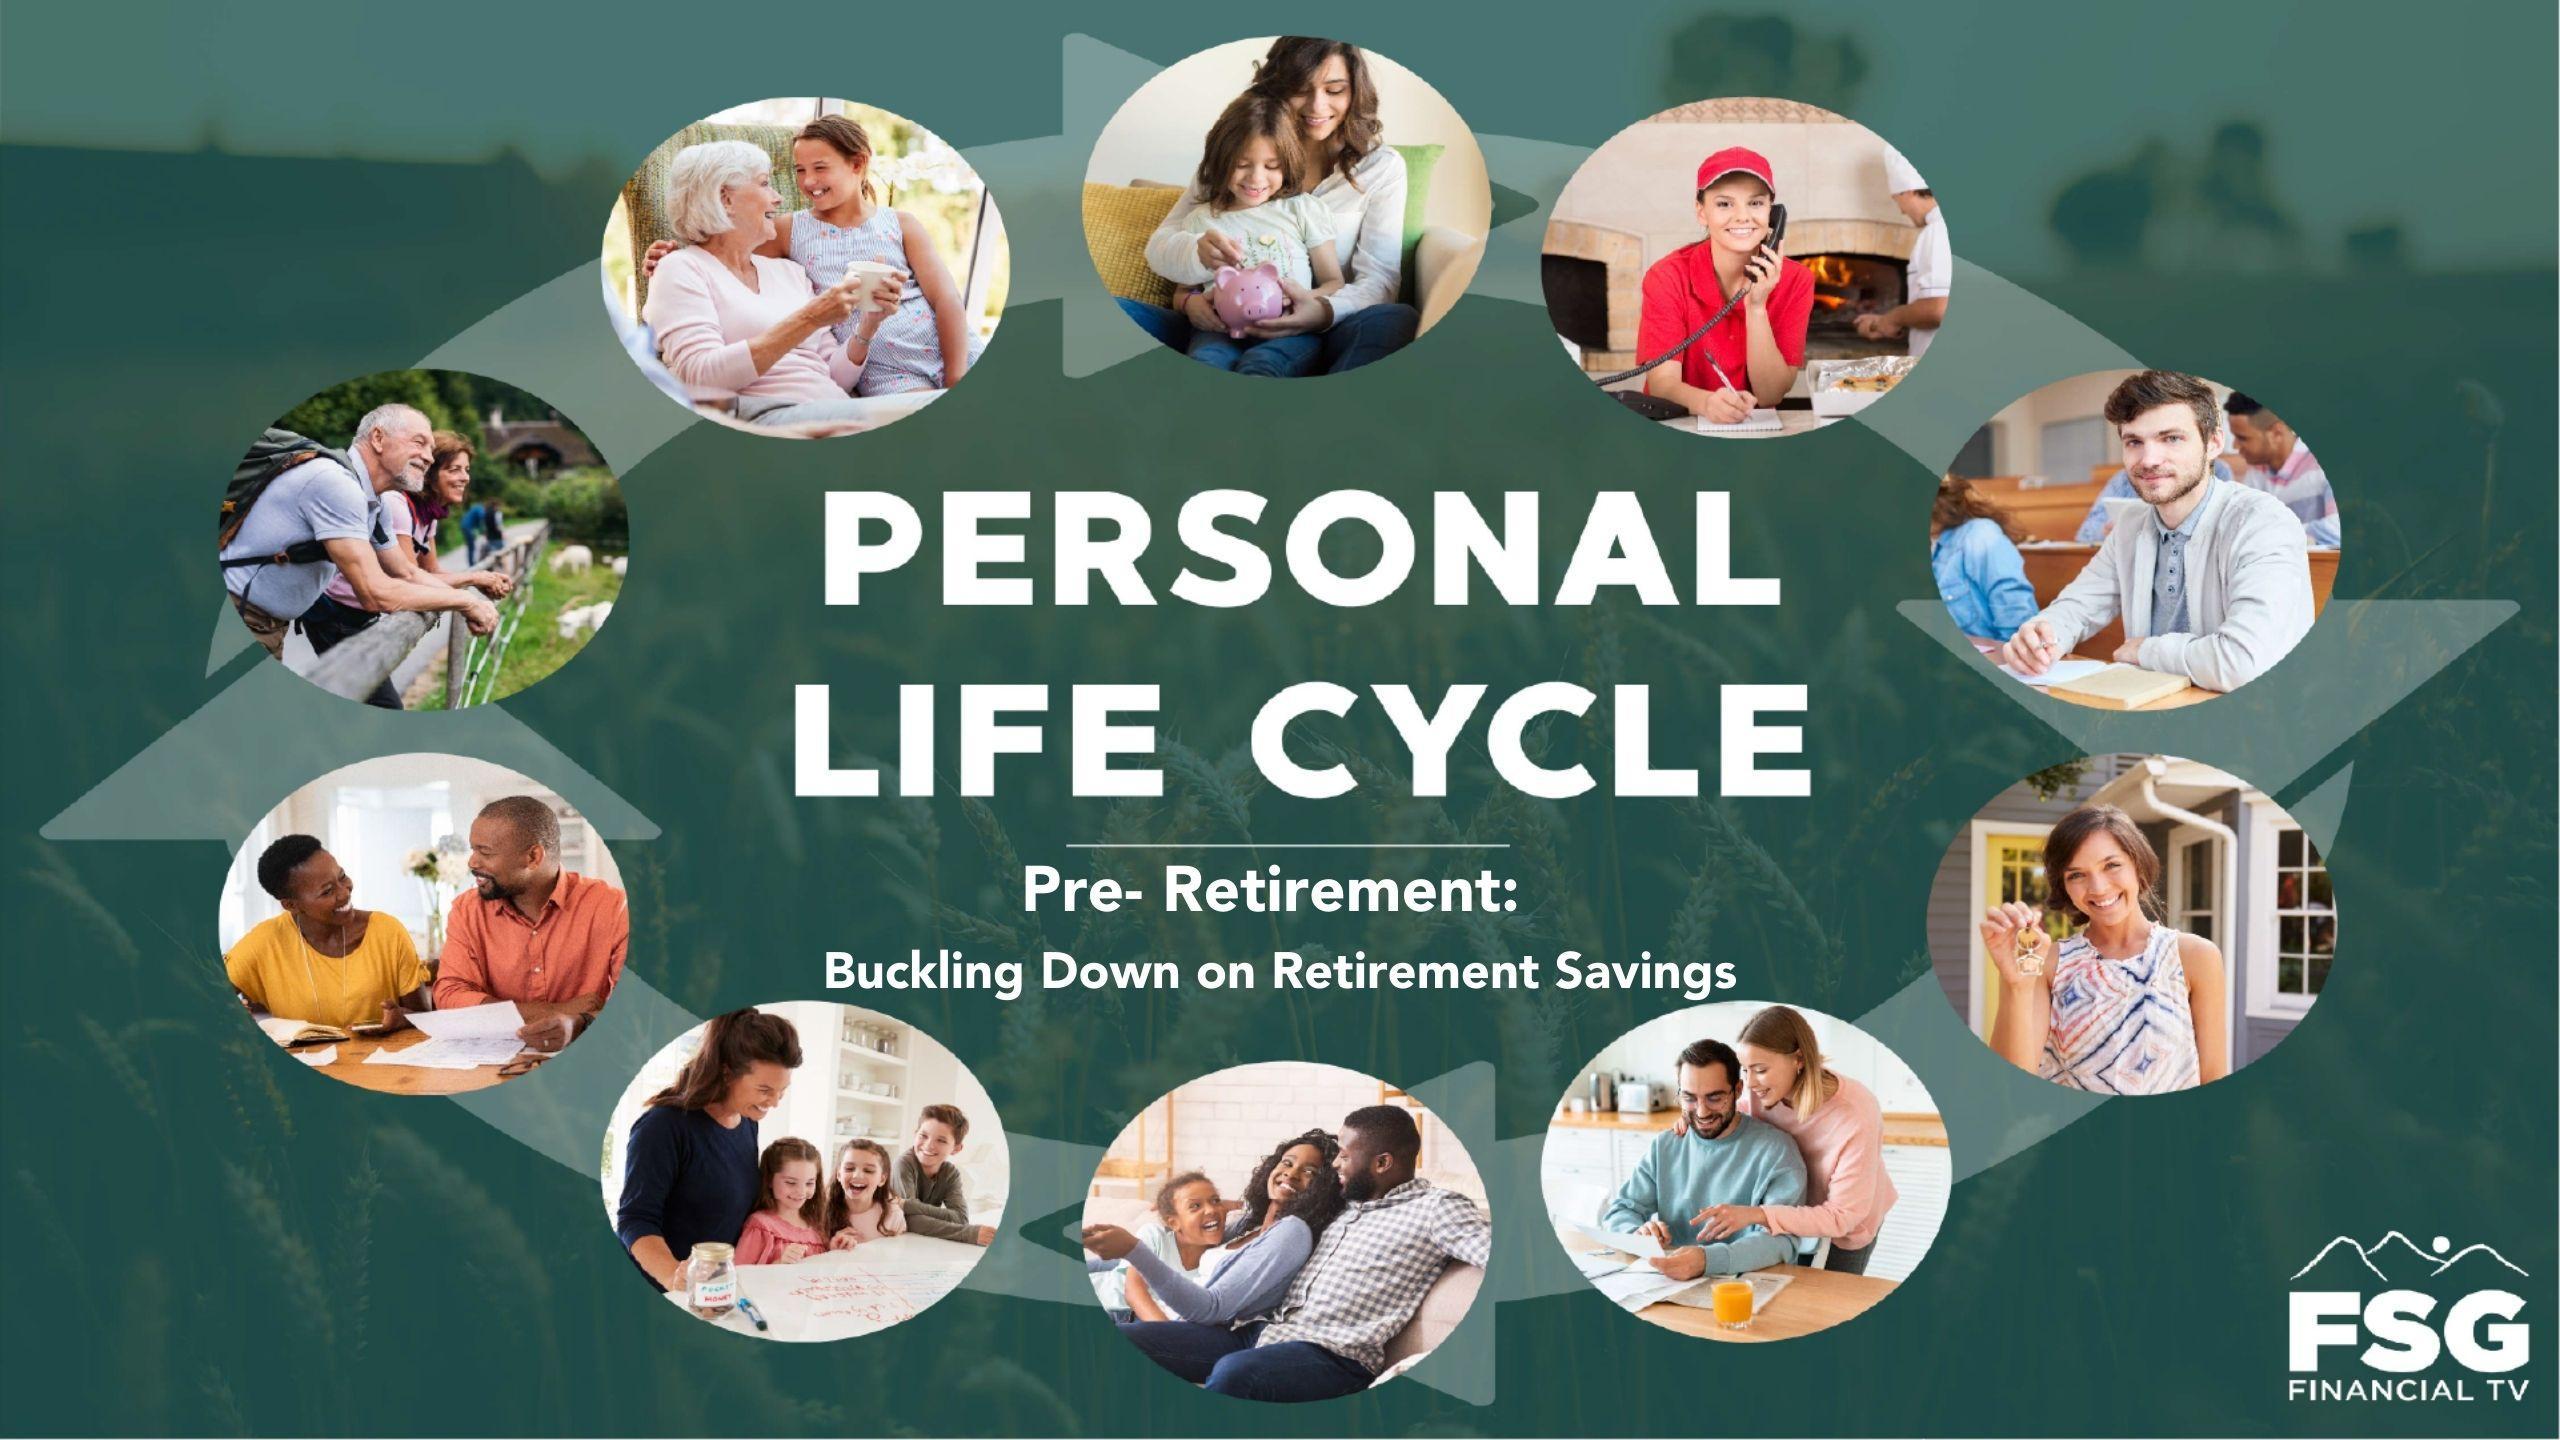 Personal Life Cycle: Pre- Retirement: Buckling Down on Retirement Savings Thumbnail